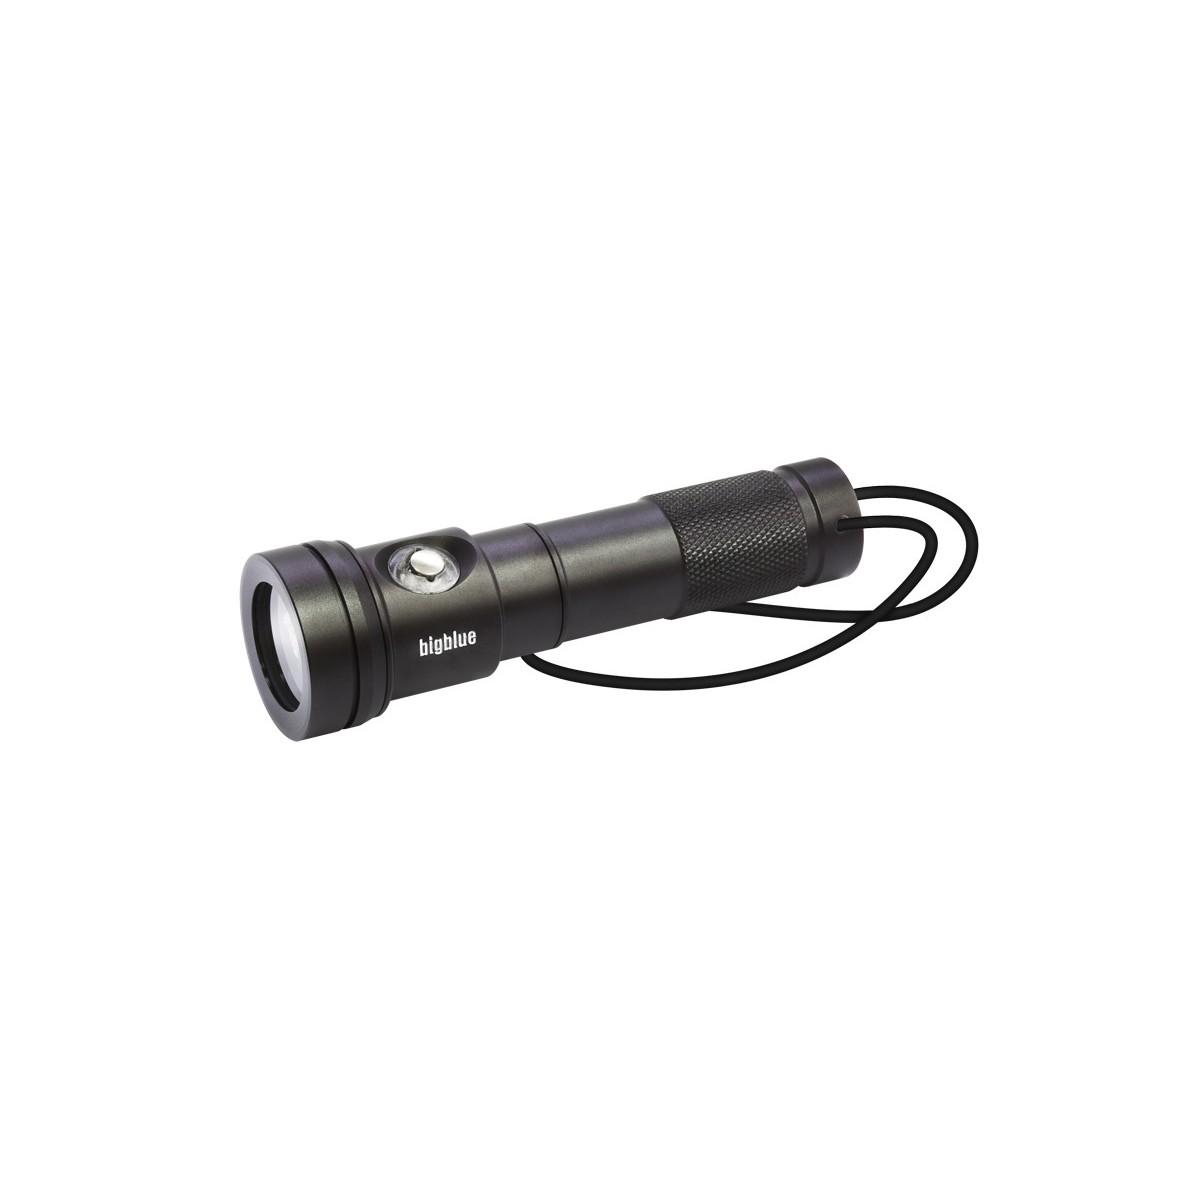 Bigblue 1200 Lumen Extra Wide-Beam (AL1200XWP)